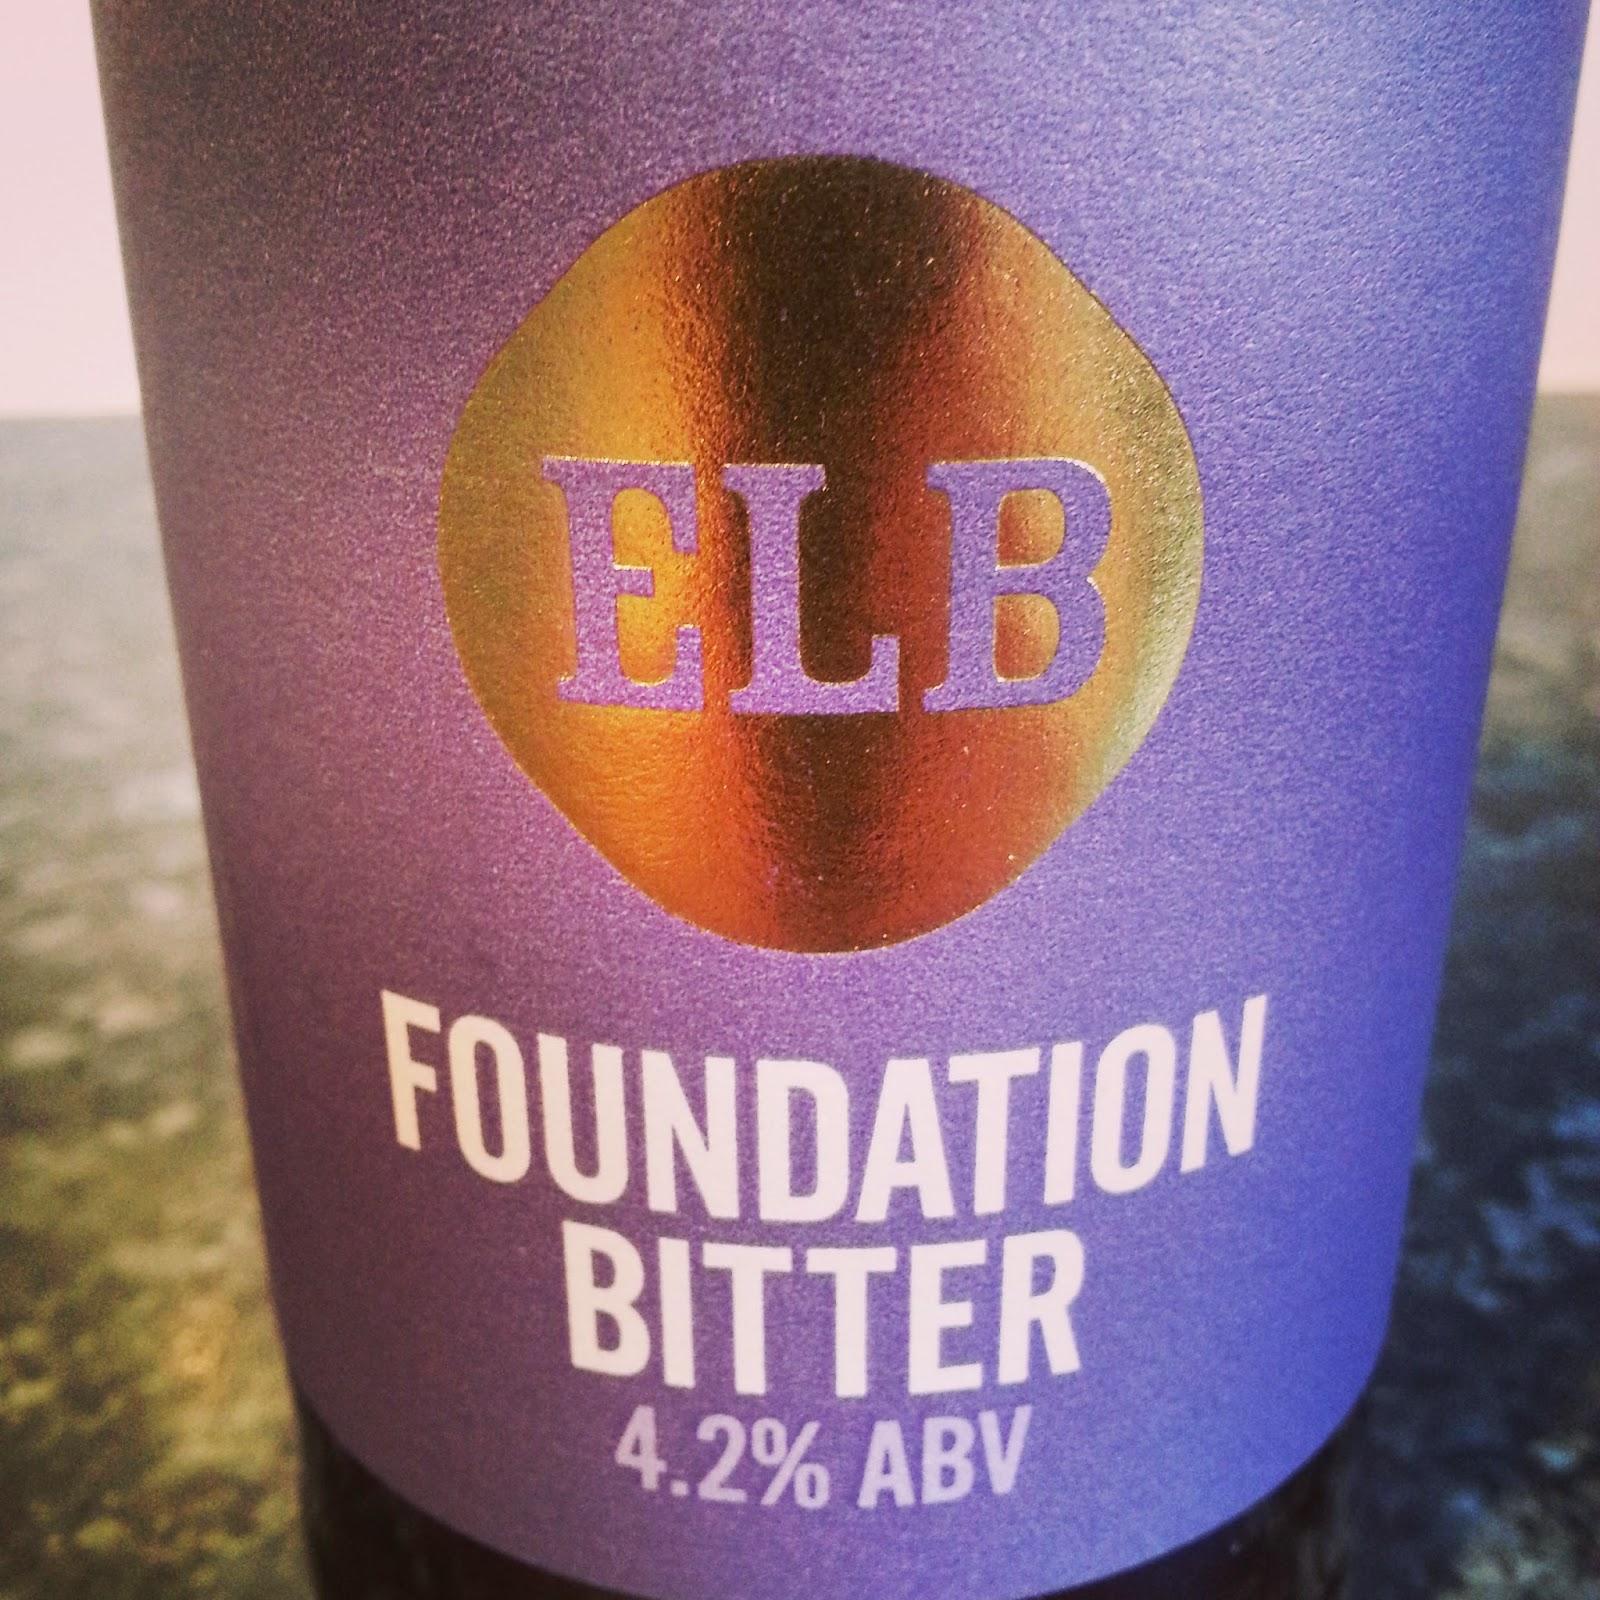 Foundation Bitter